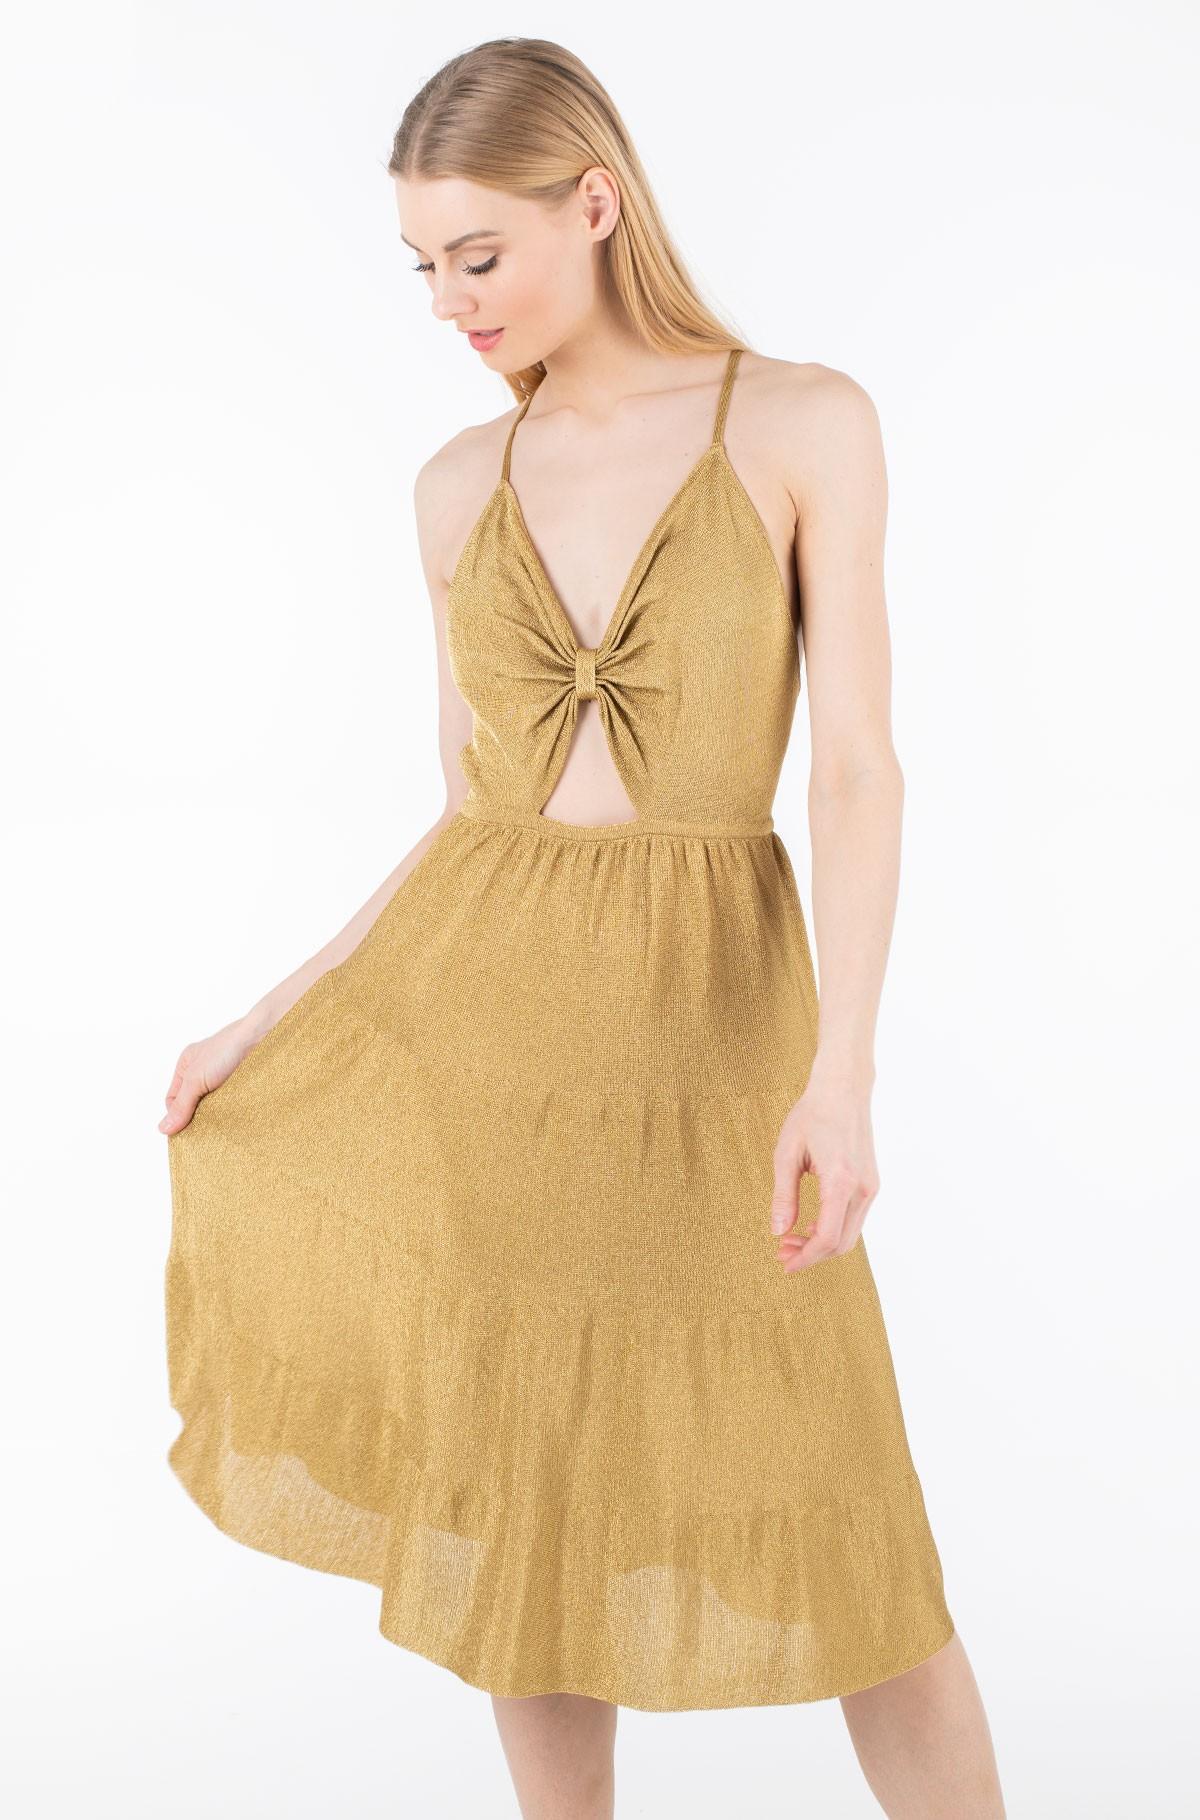 Suknelė ZENDAYA LUREX TIE FRONT DRESS-full-1